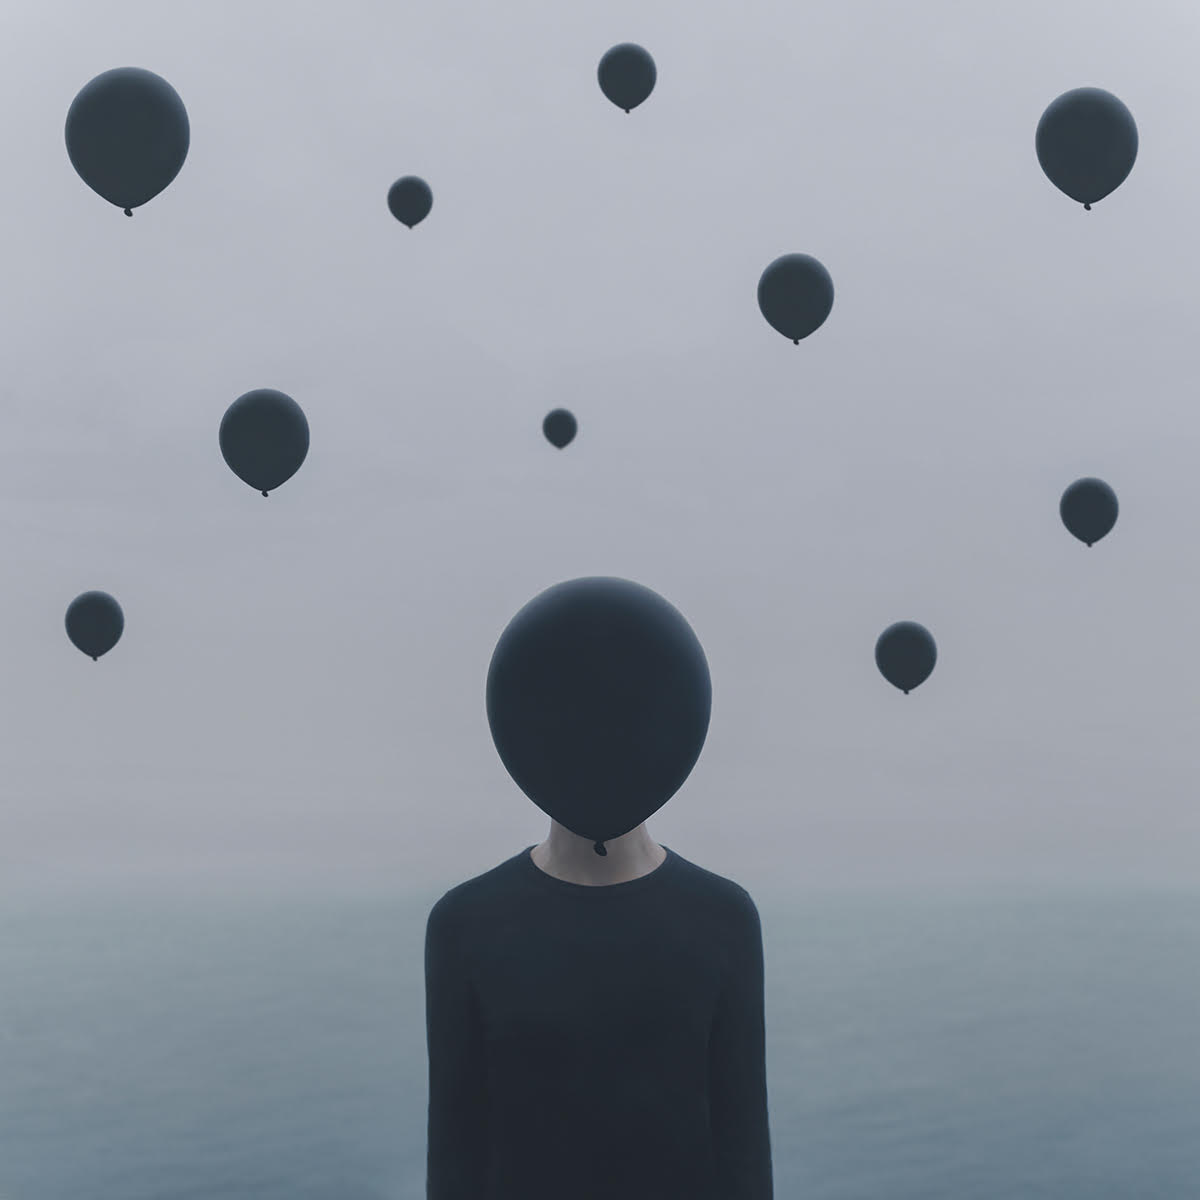 Gabriel Isak's surreal and melancholy photographs